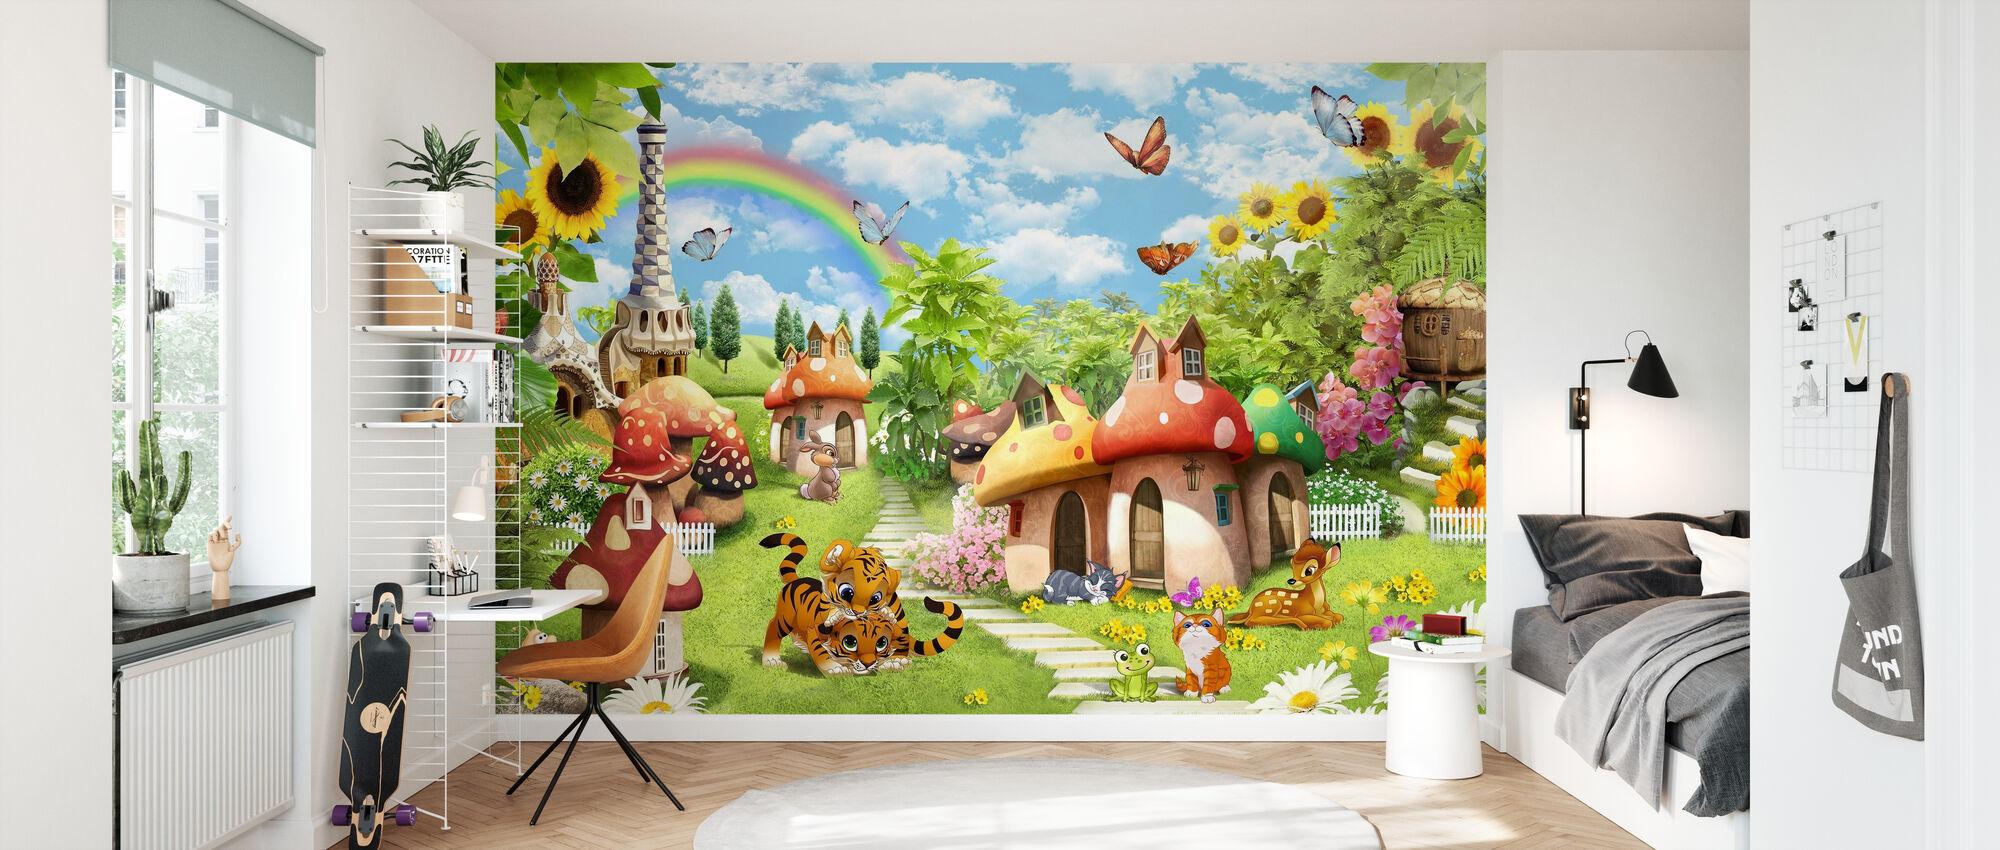 Sponge Village - Wallpaper - Kids Room